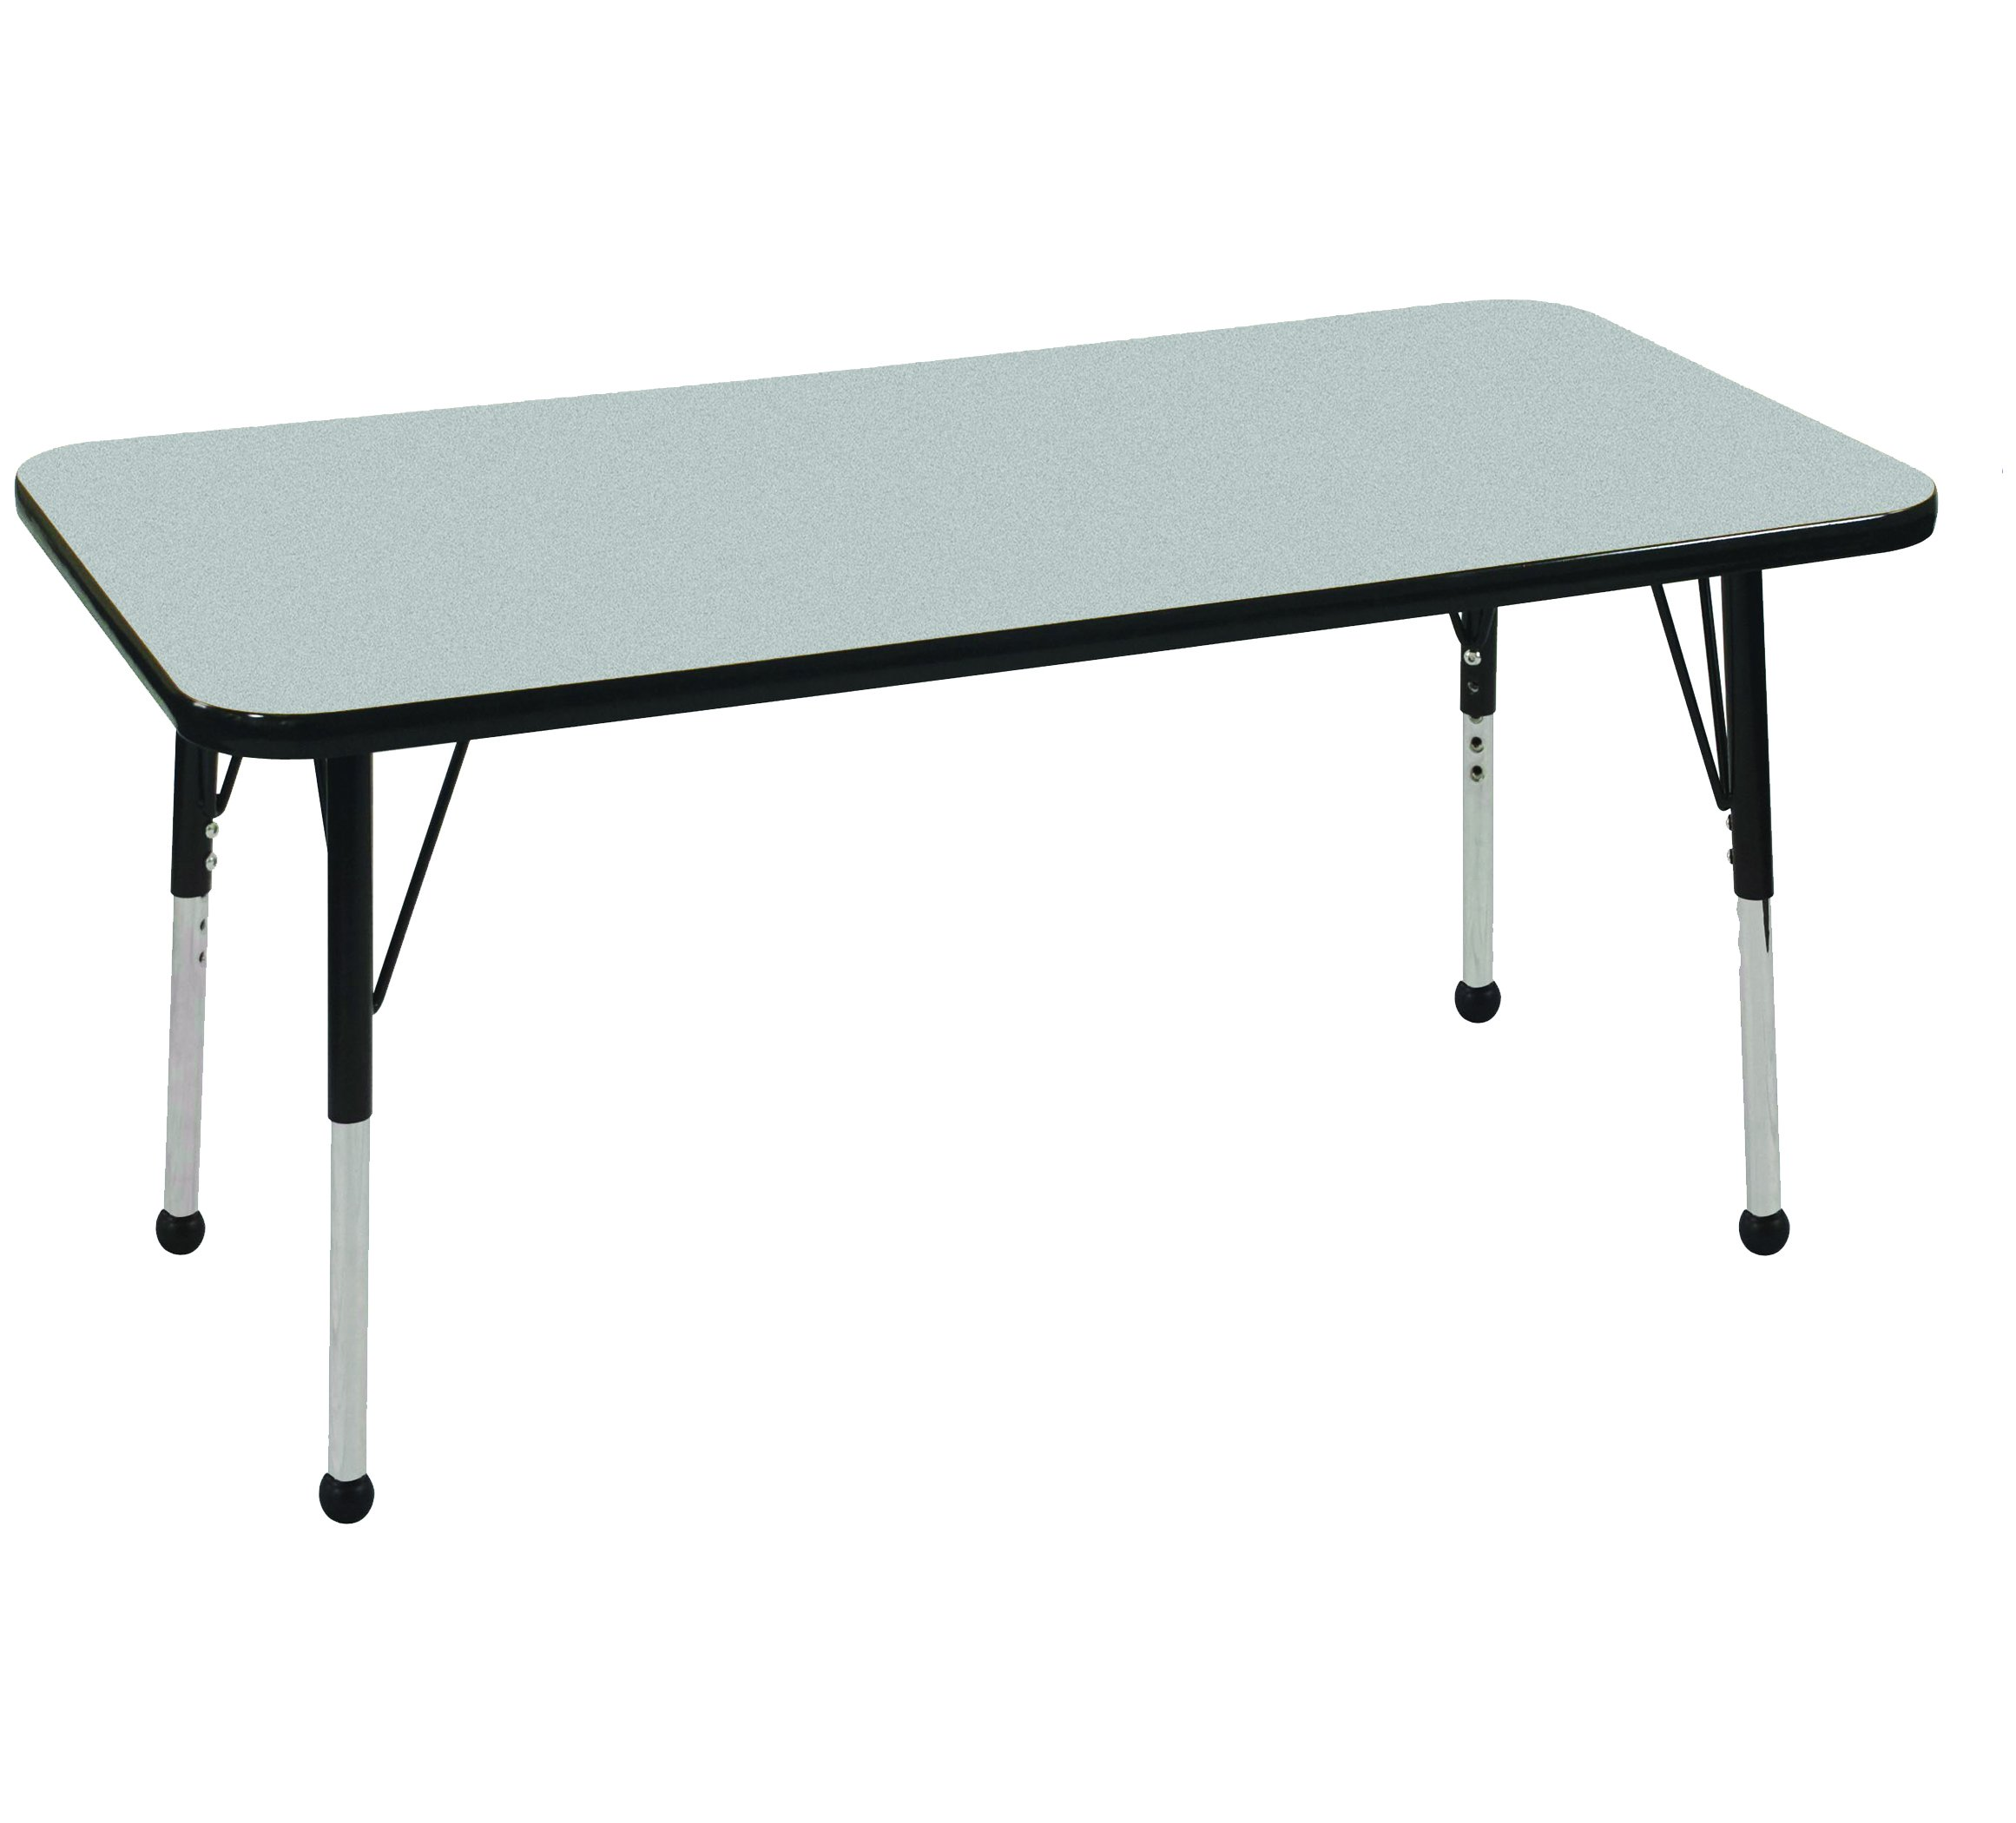 ECR4Kids 24'' x 48'' Rectangular Activity School Table, Standard Legs w/Ball Glides, Adjustable Height 19-30 inch (Grey/Black)